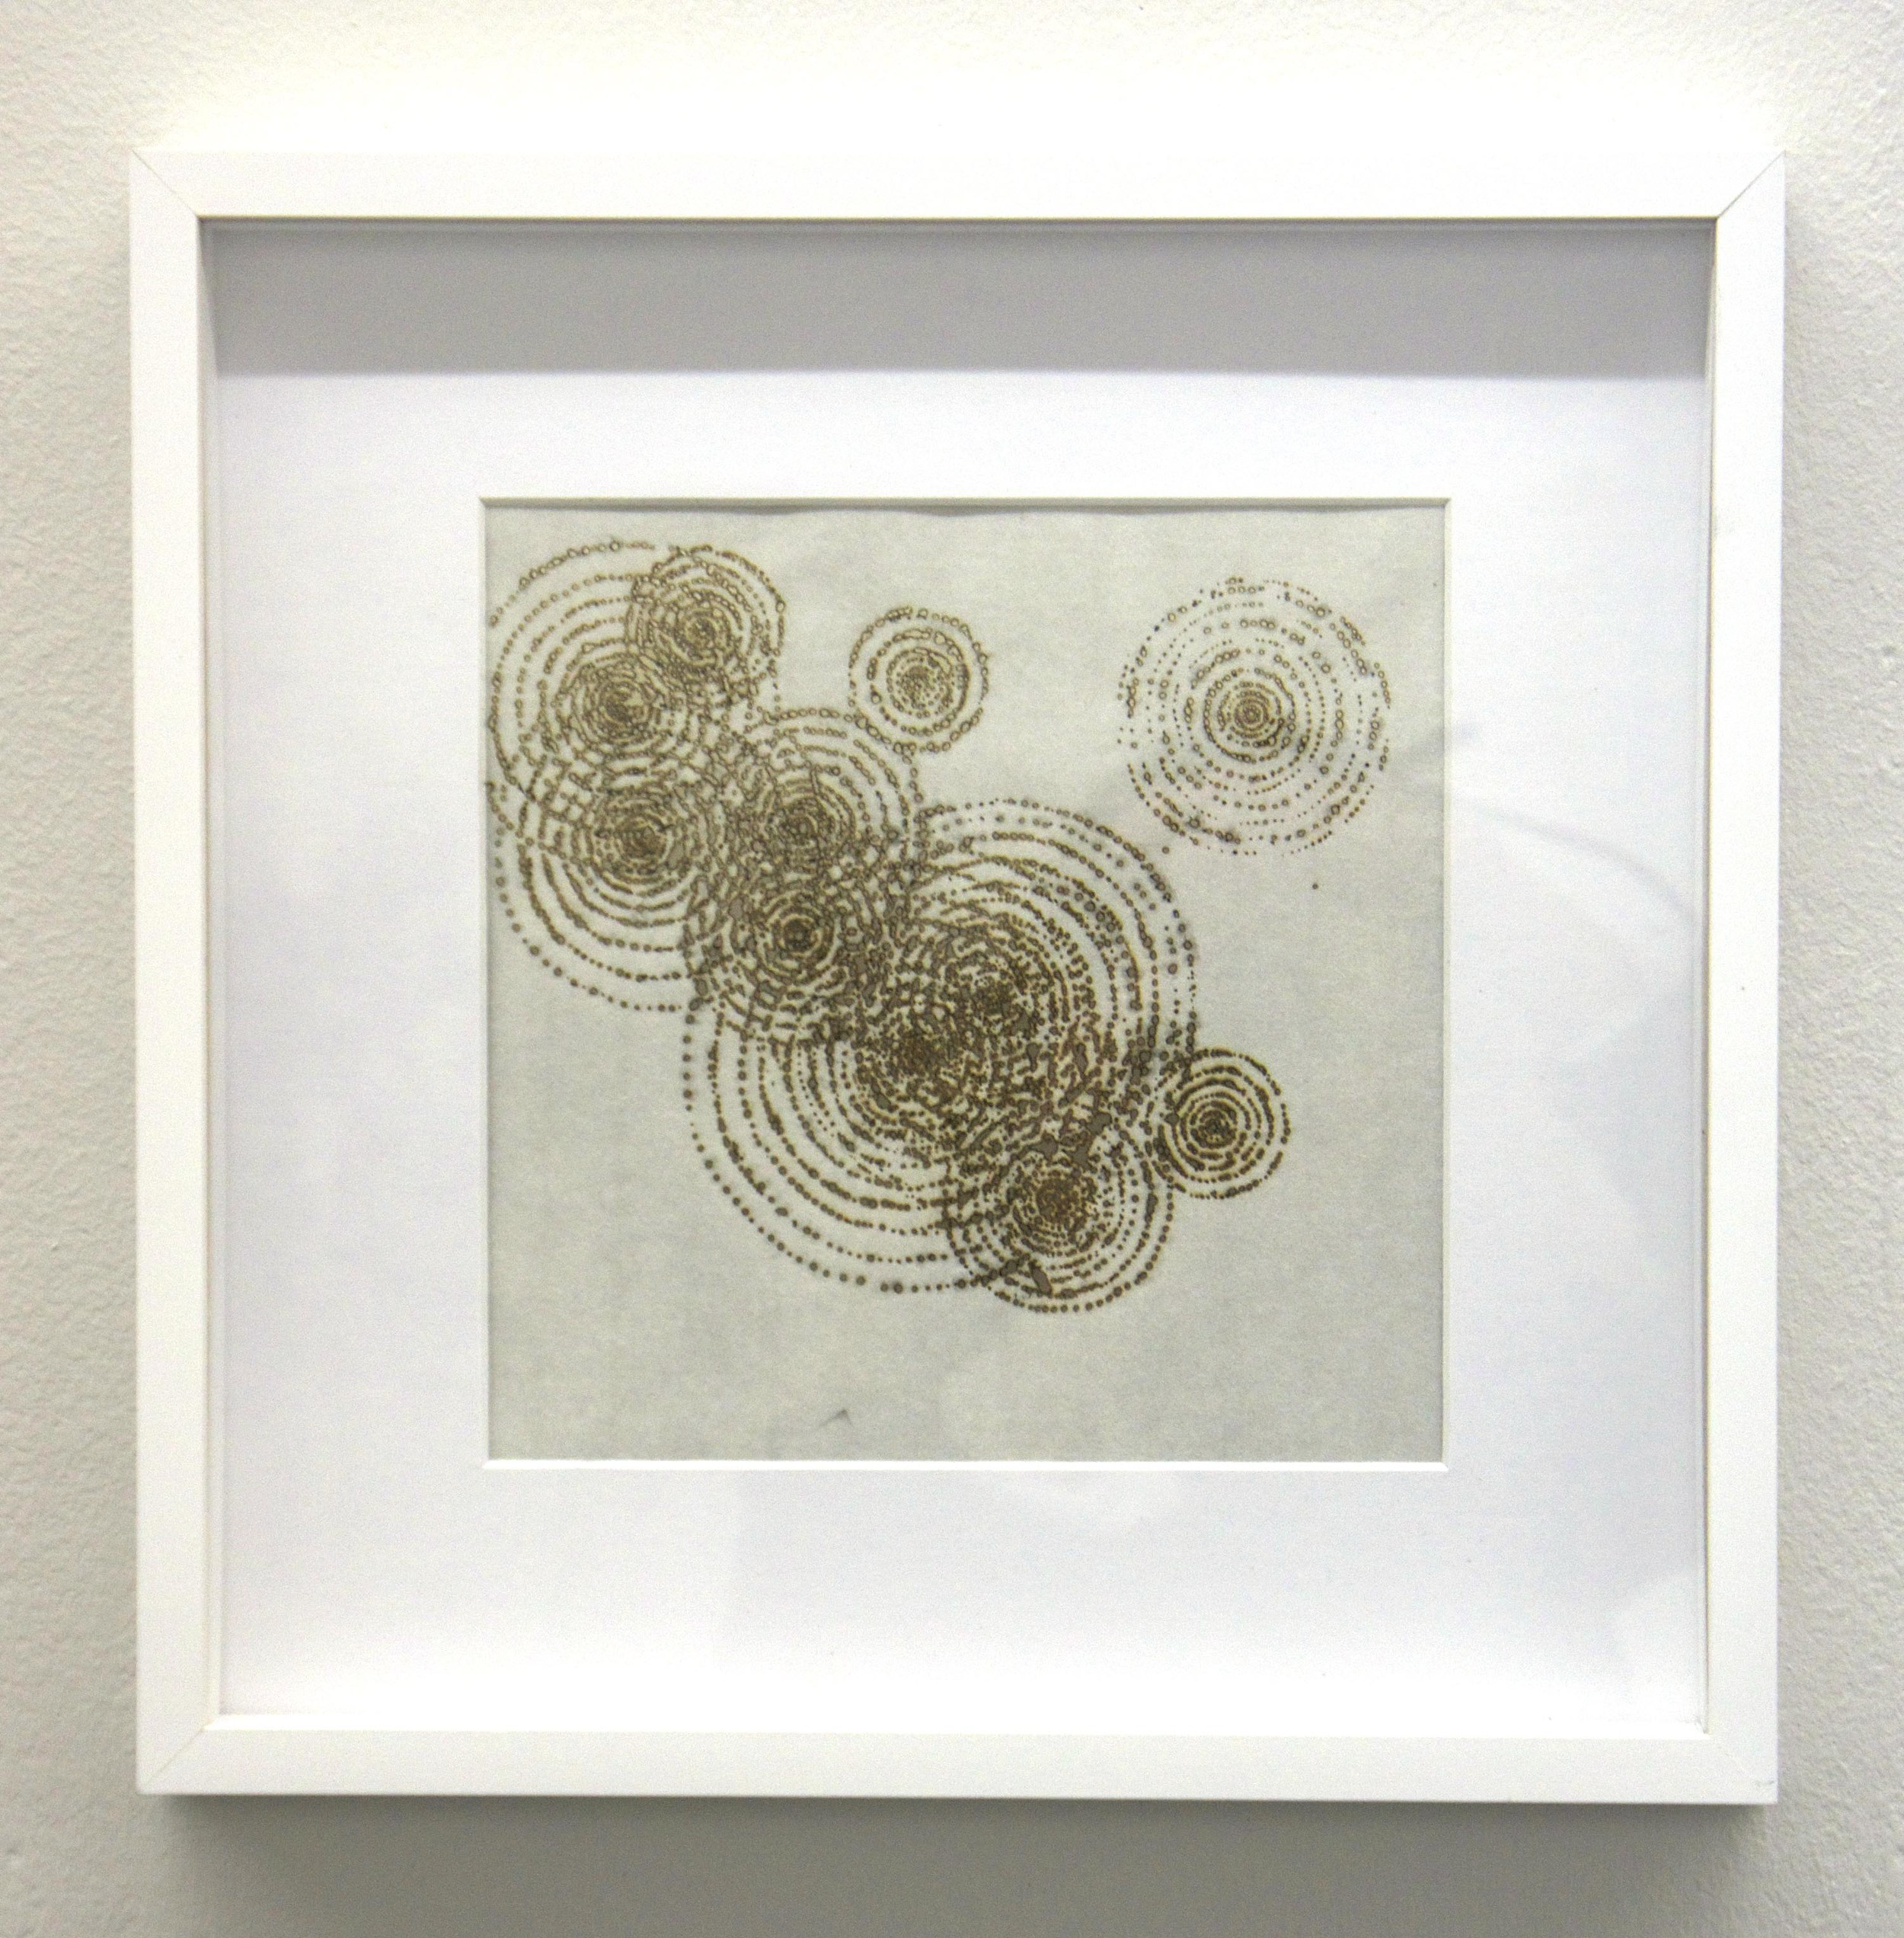 'Raindrops', incense burnt rice paper, 30x30 cm